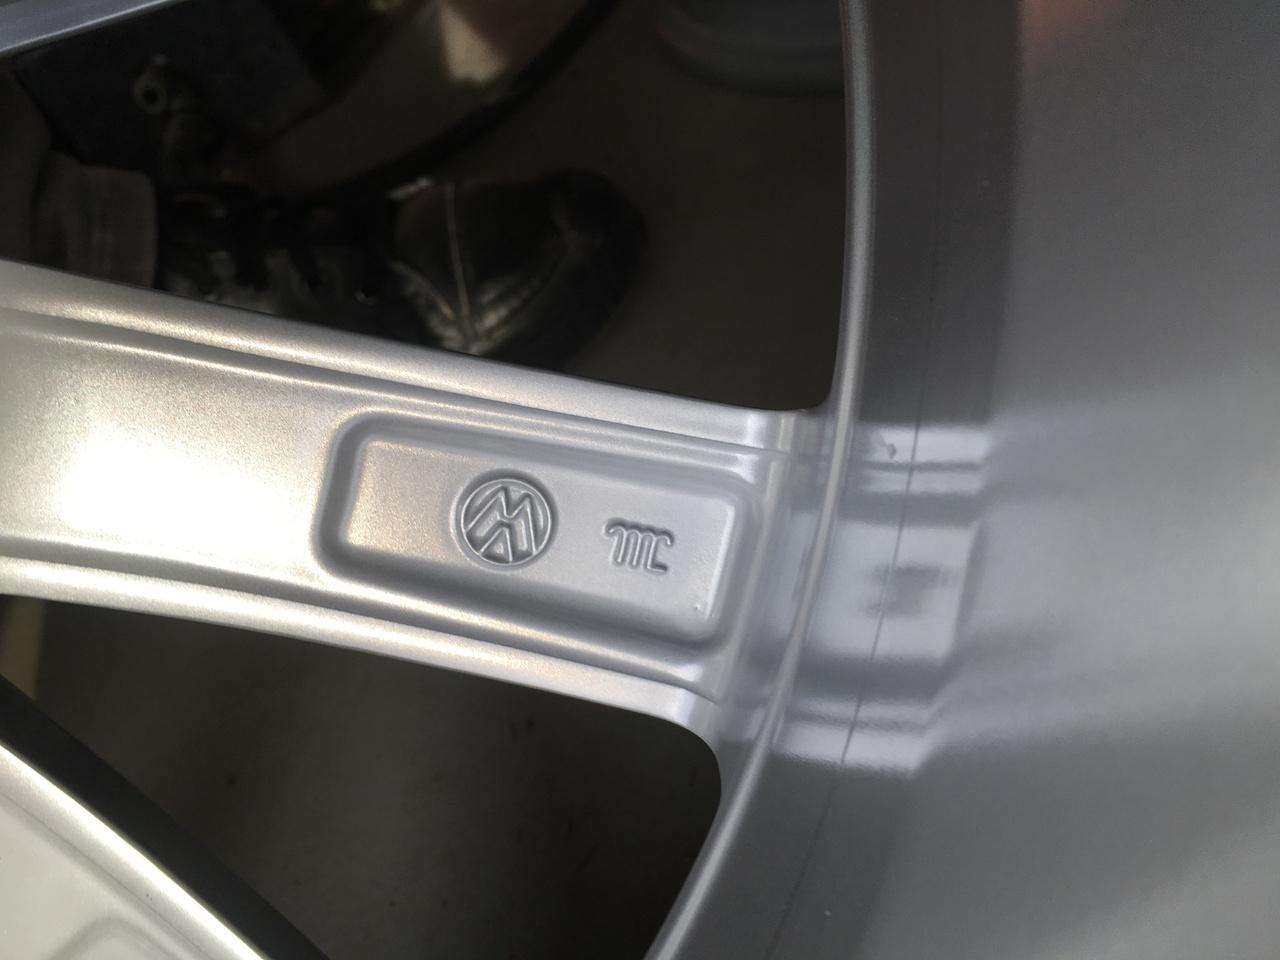 "VAND JANTE ORIGINALE VW PE 17"" NOI"